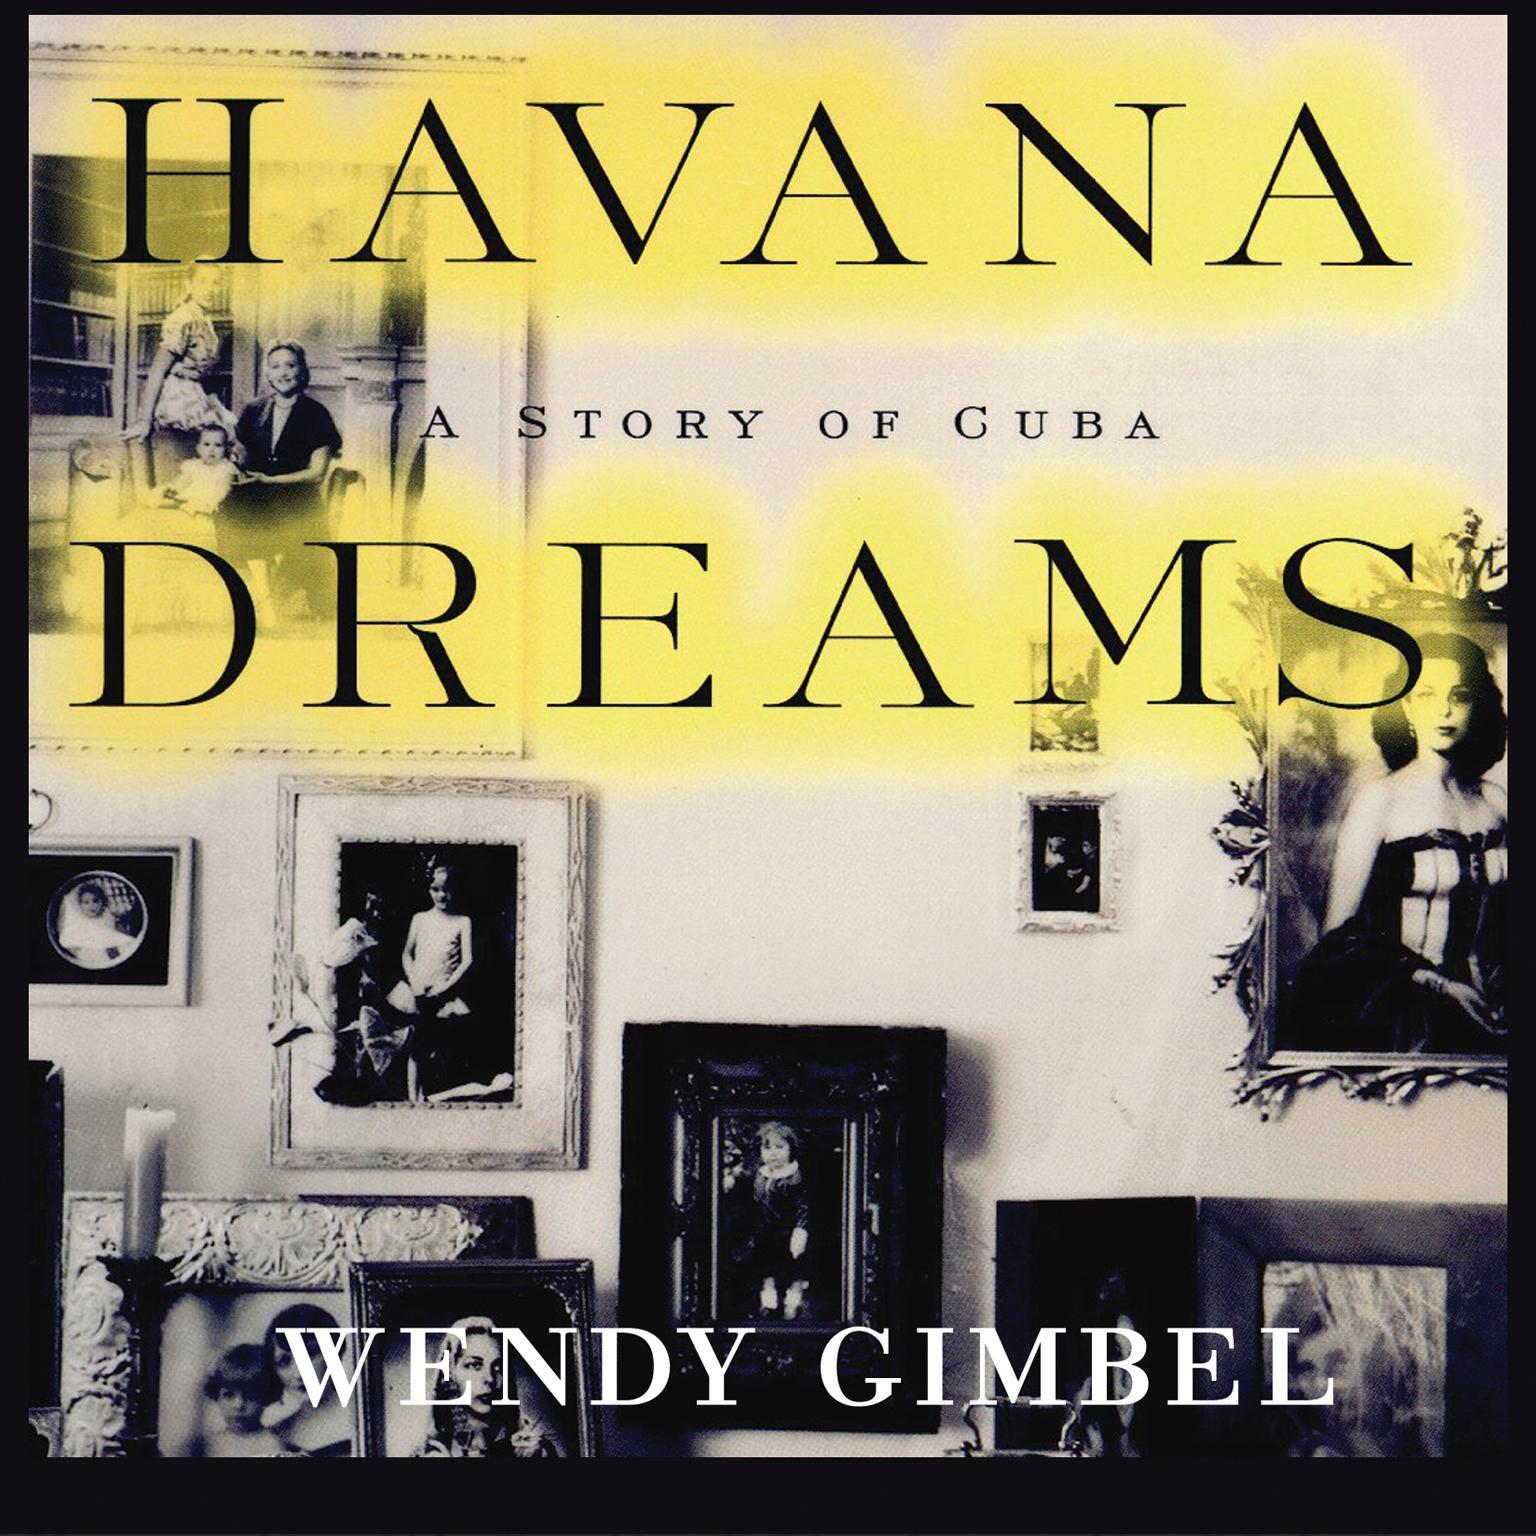 Havana Dreams: A Story of Cuba Audiobook, by Wendy Gimbel